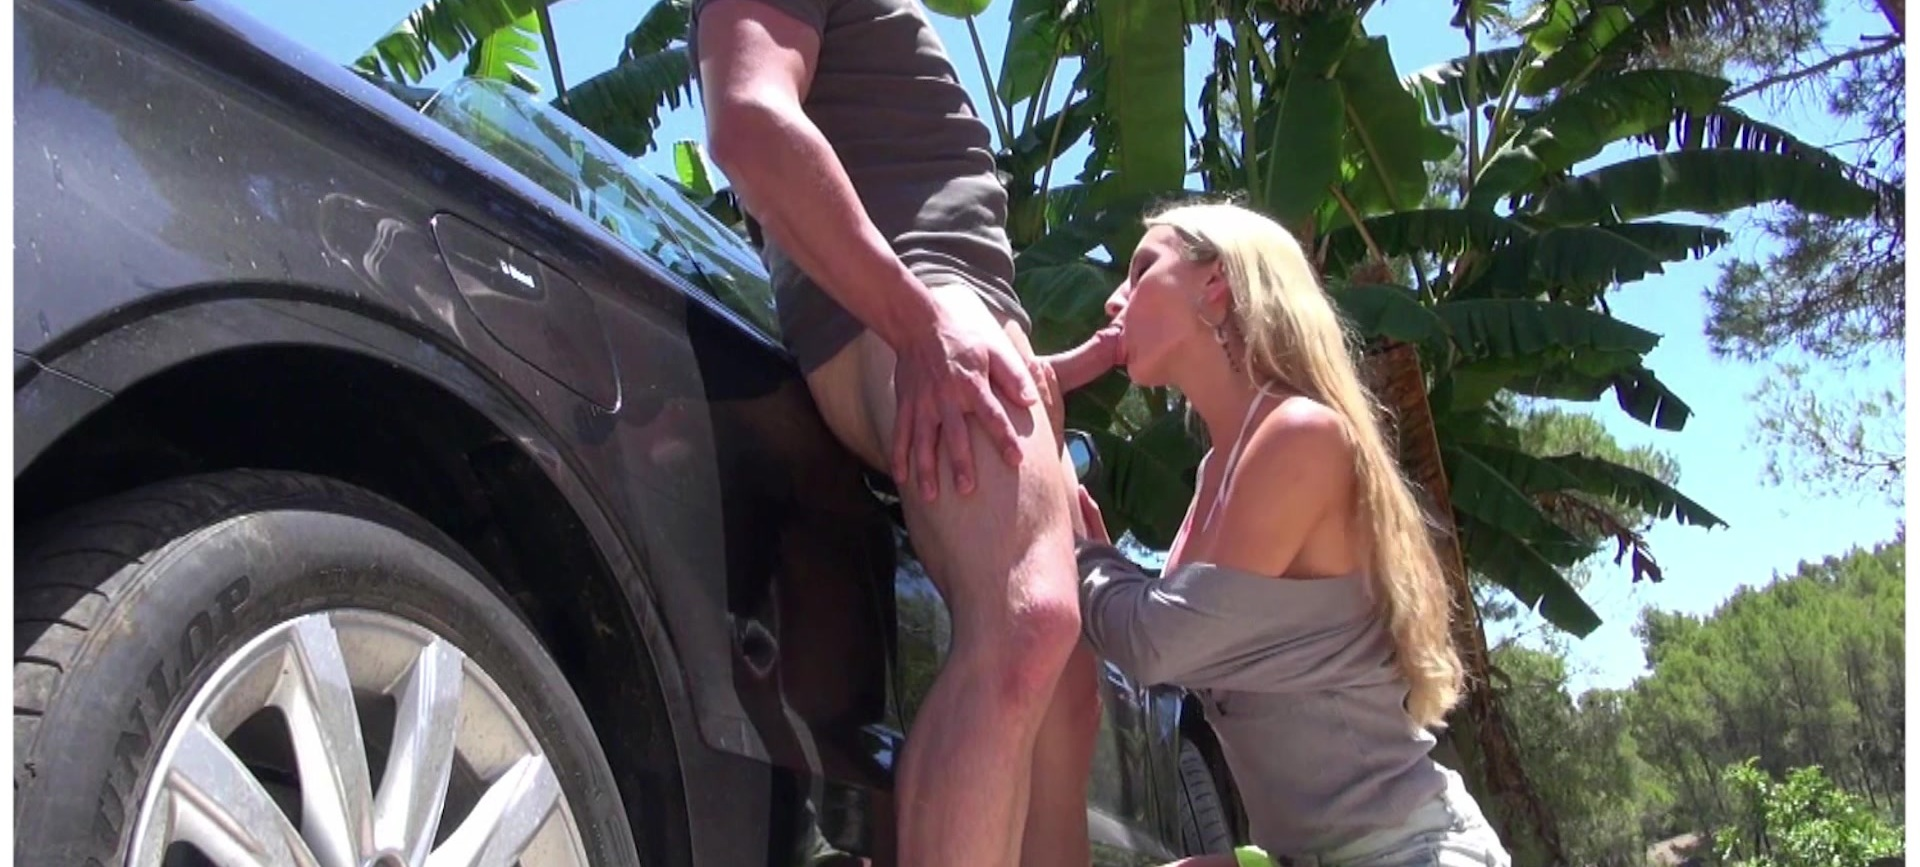 My Dirty Hobby - SexxyGirl bringt uns den Sommer zurueck!